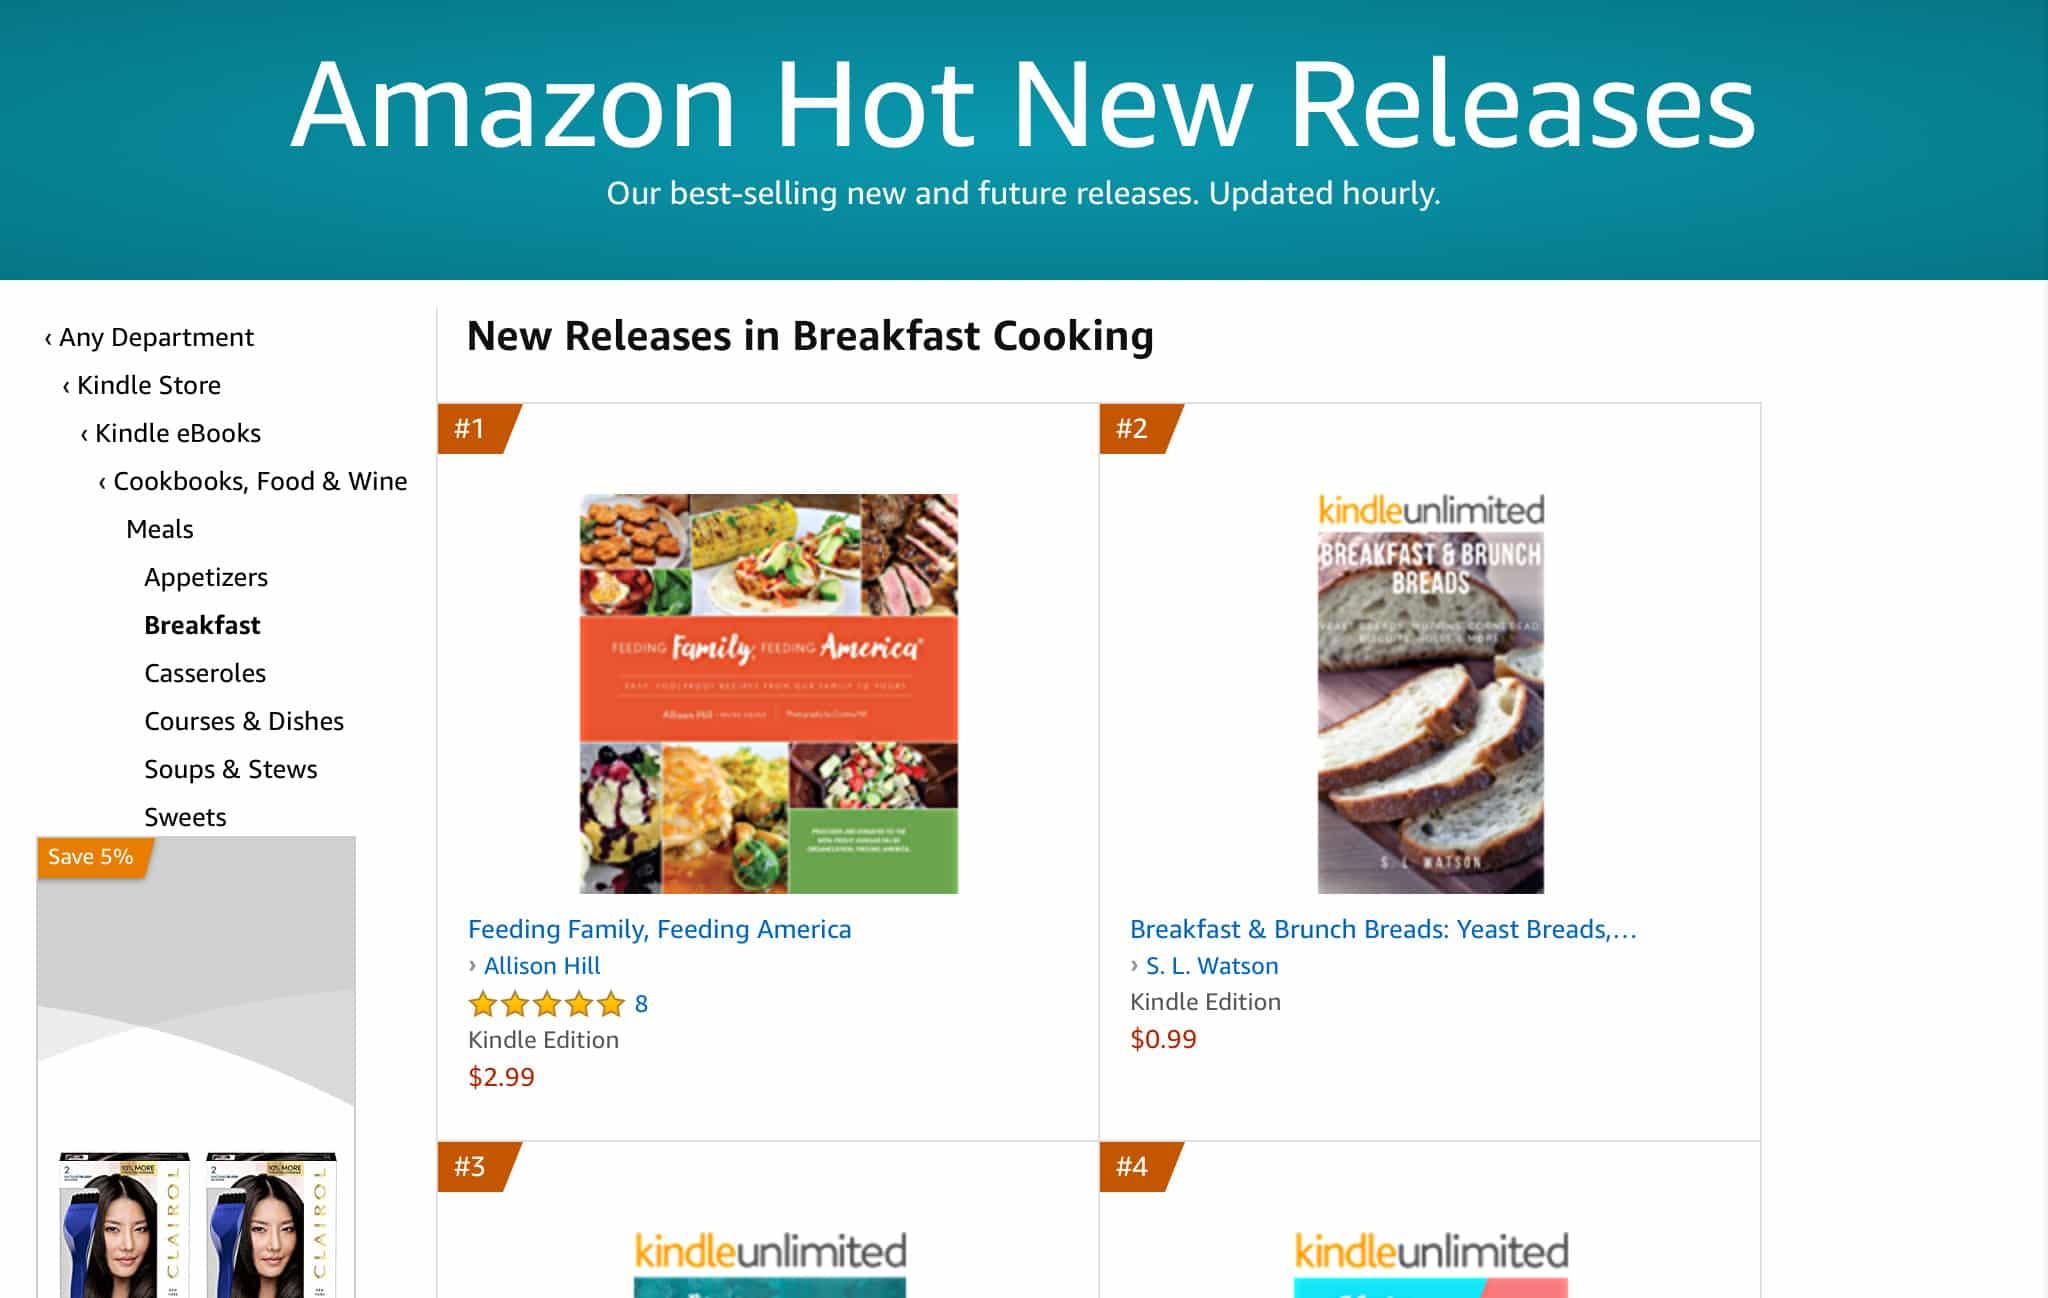 Feeding Family Feeding America Amazon Best Seller by allison hill 2   Mindstir Media Book Cover